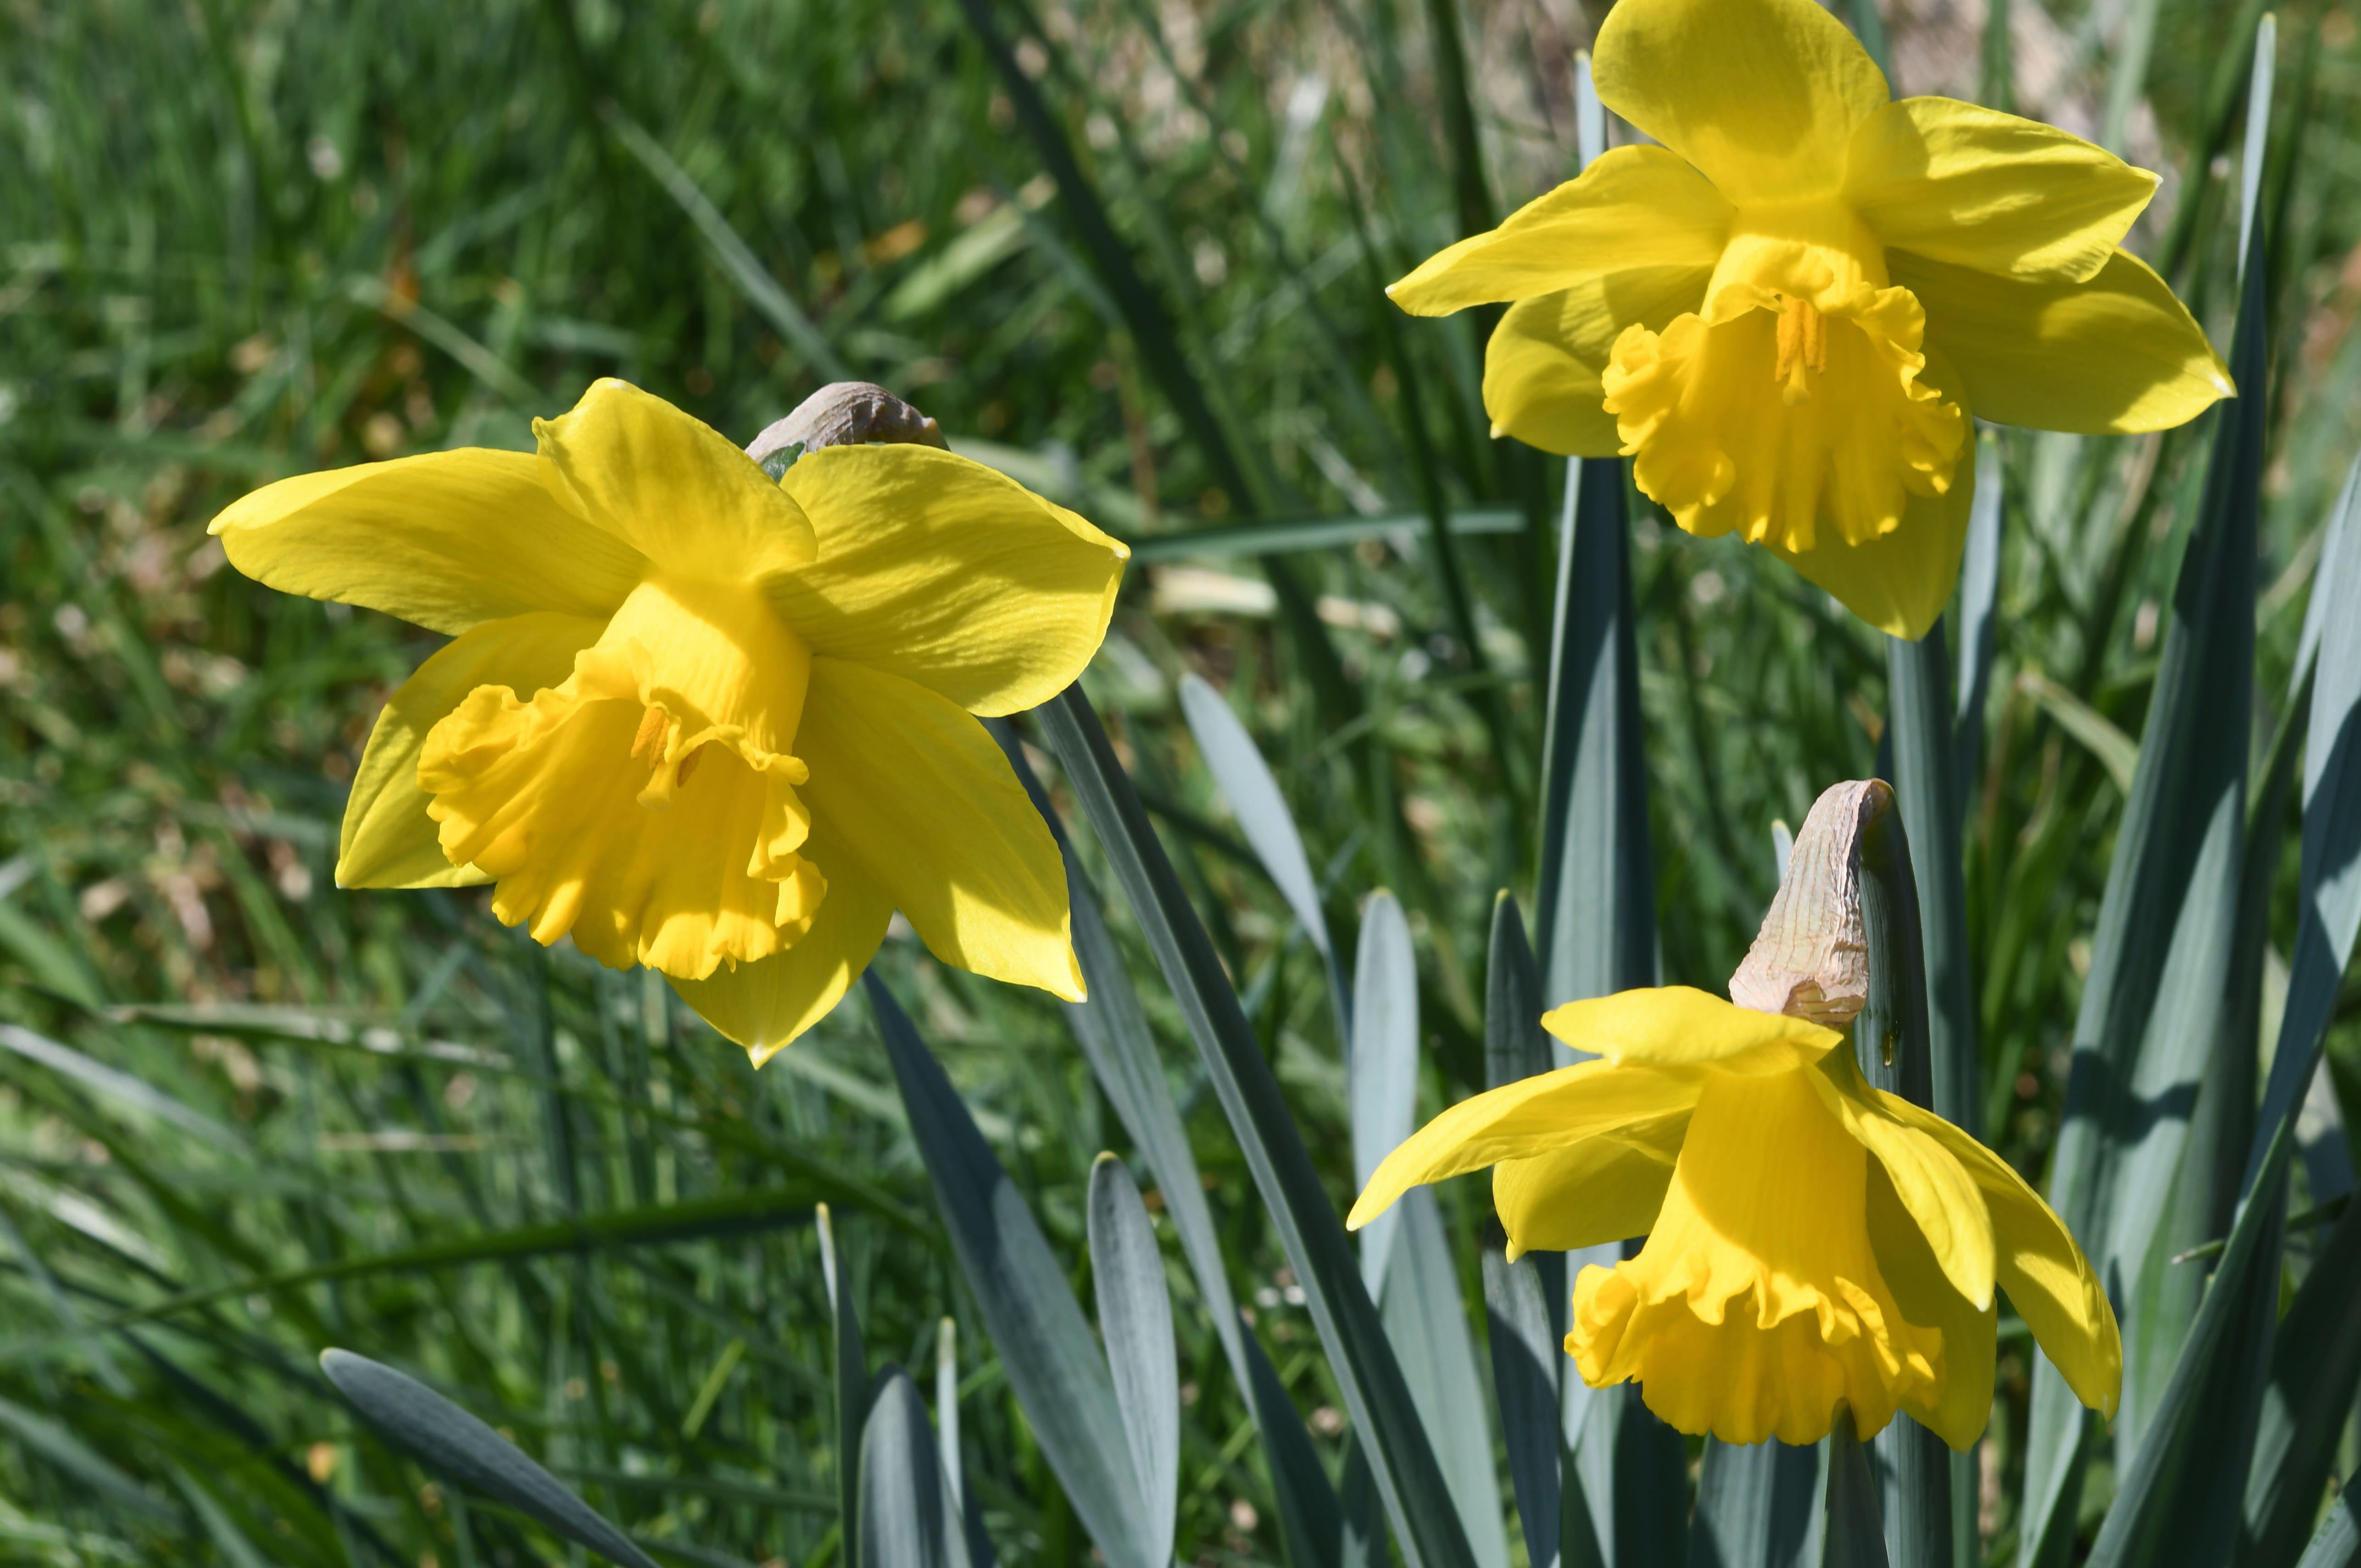 daffodils-photo-56